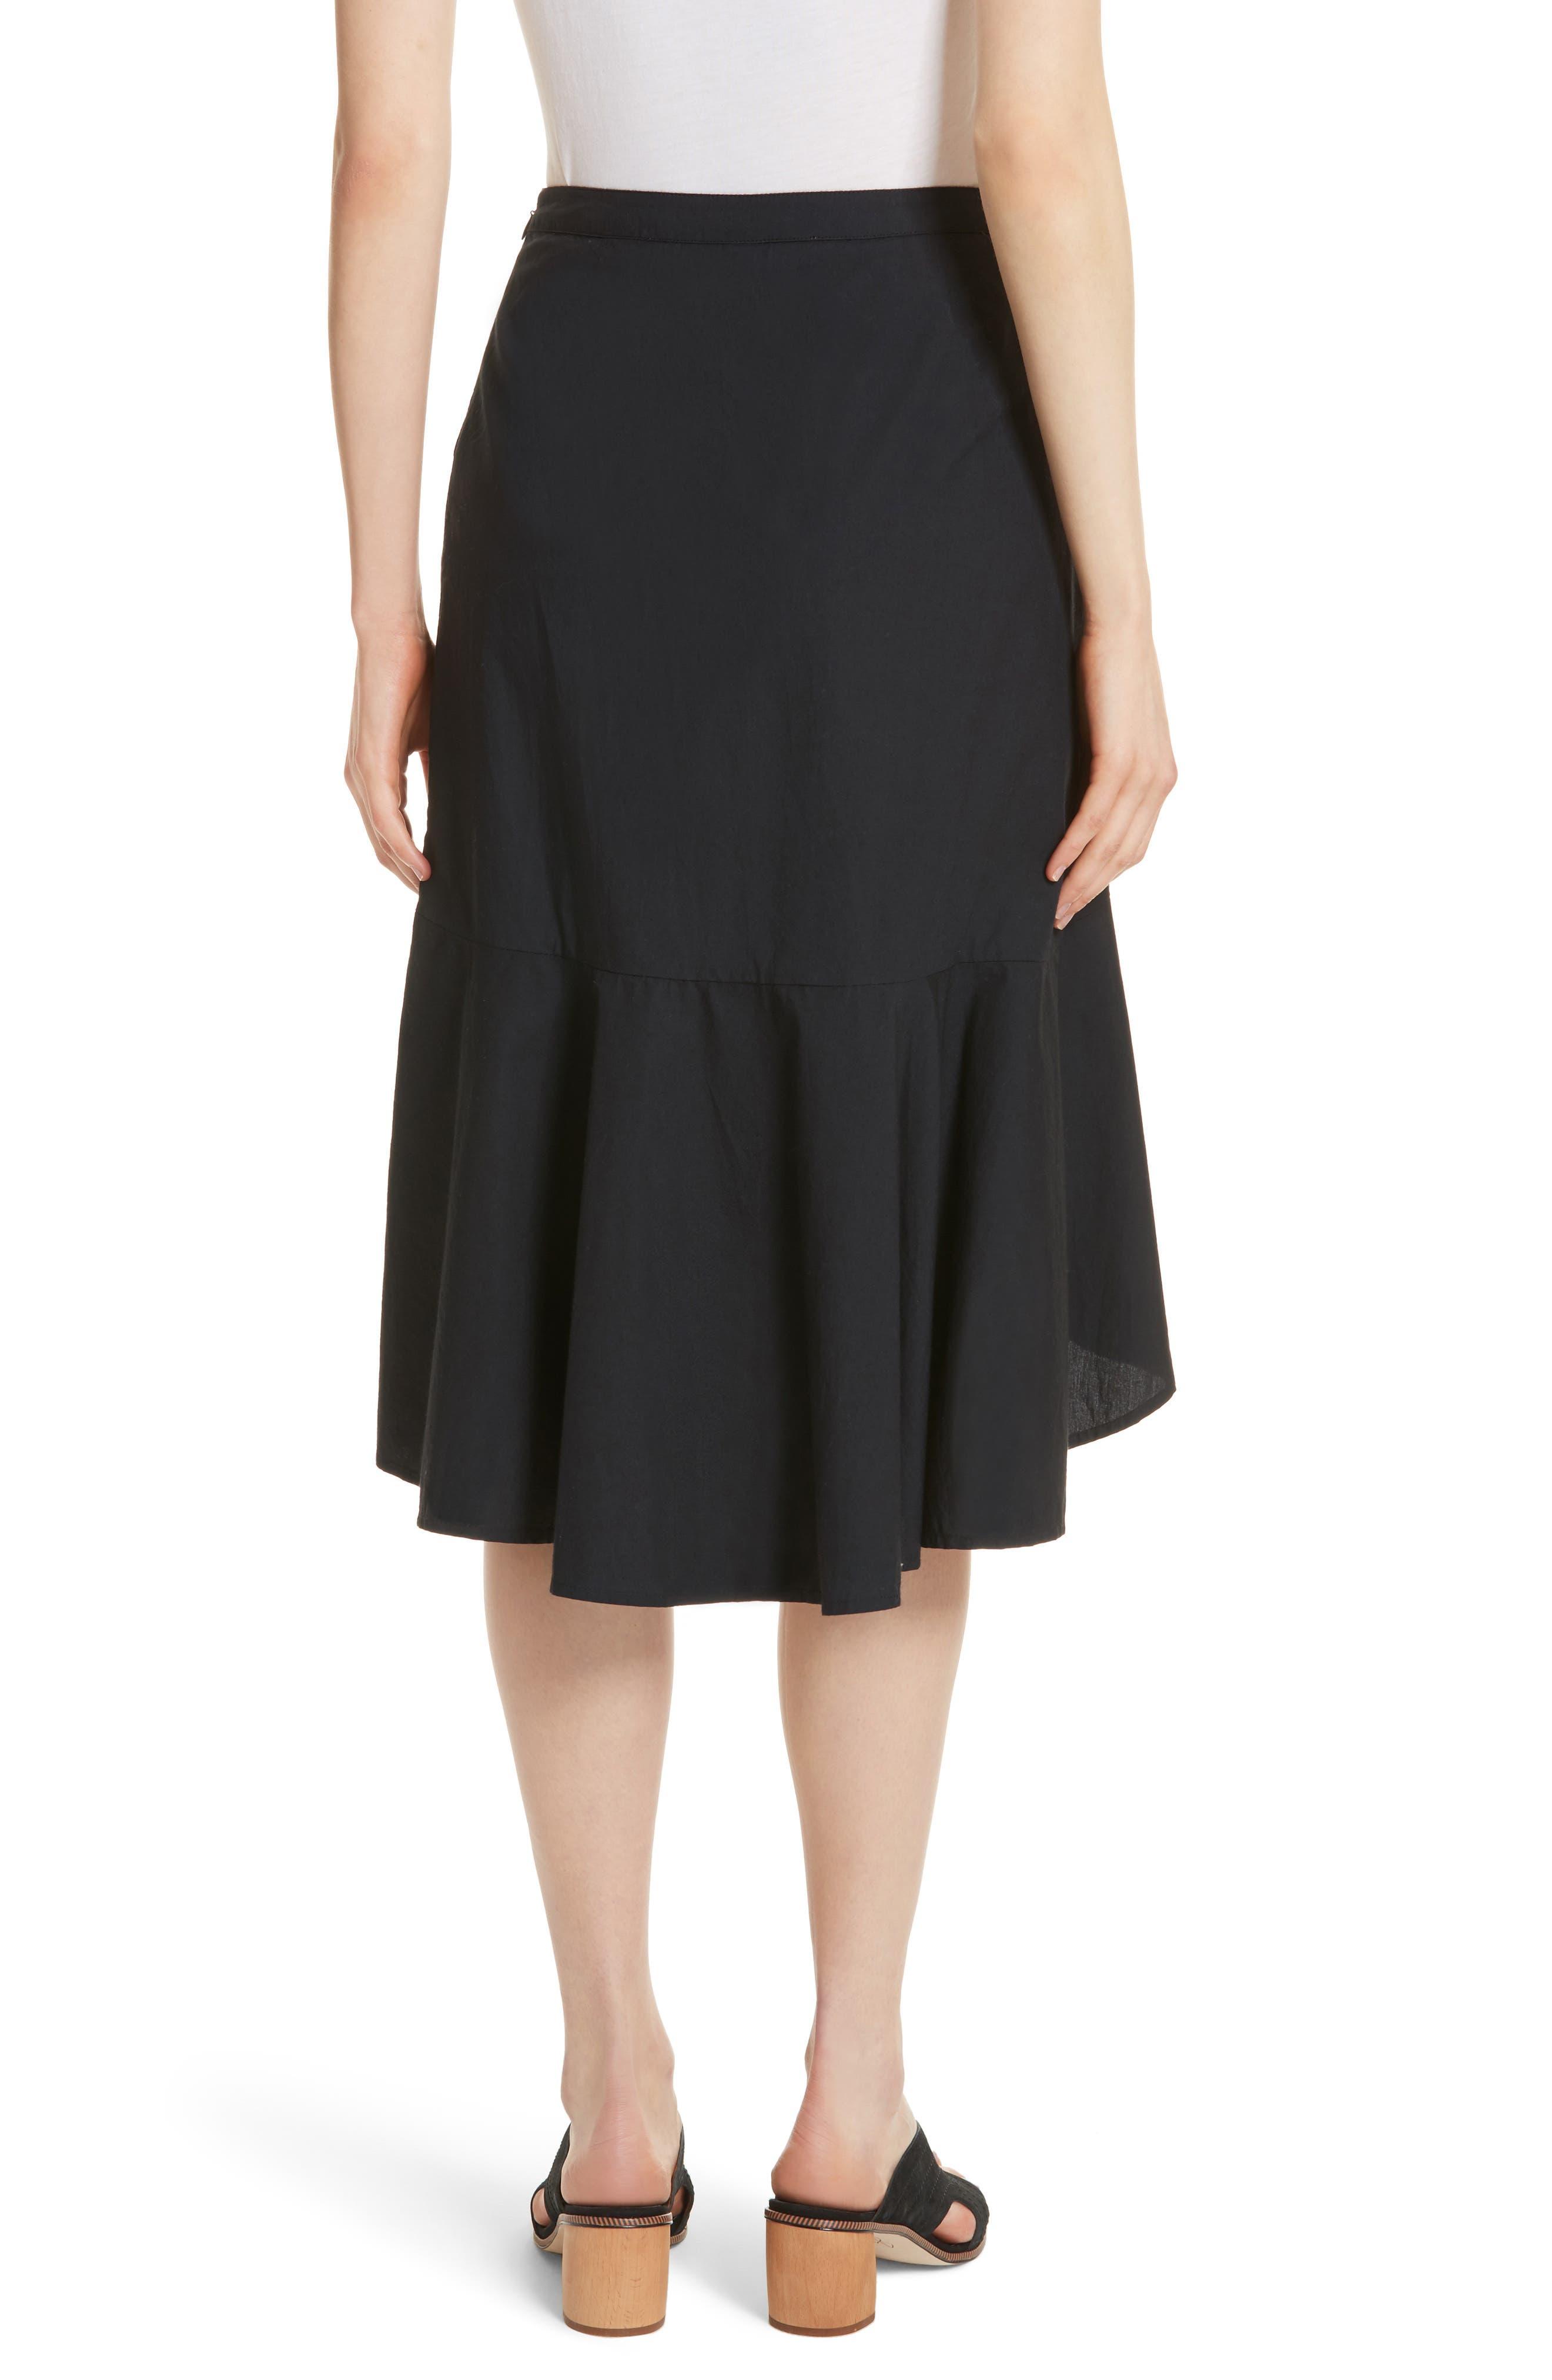 Chesmu Ruffled Cotton Skirt,                             Alternate thumbnail 2, color,                             001